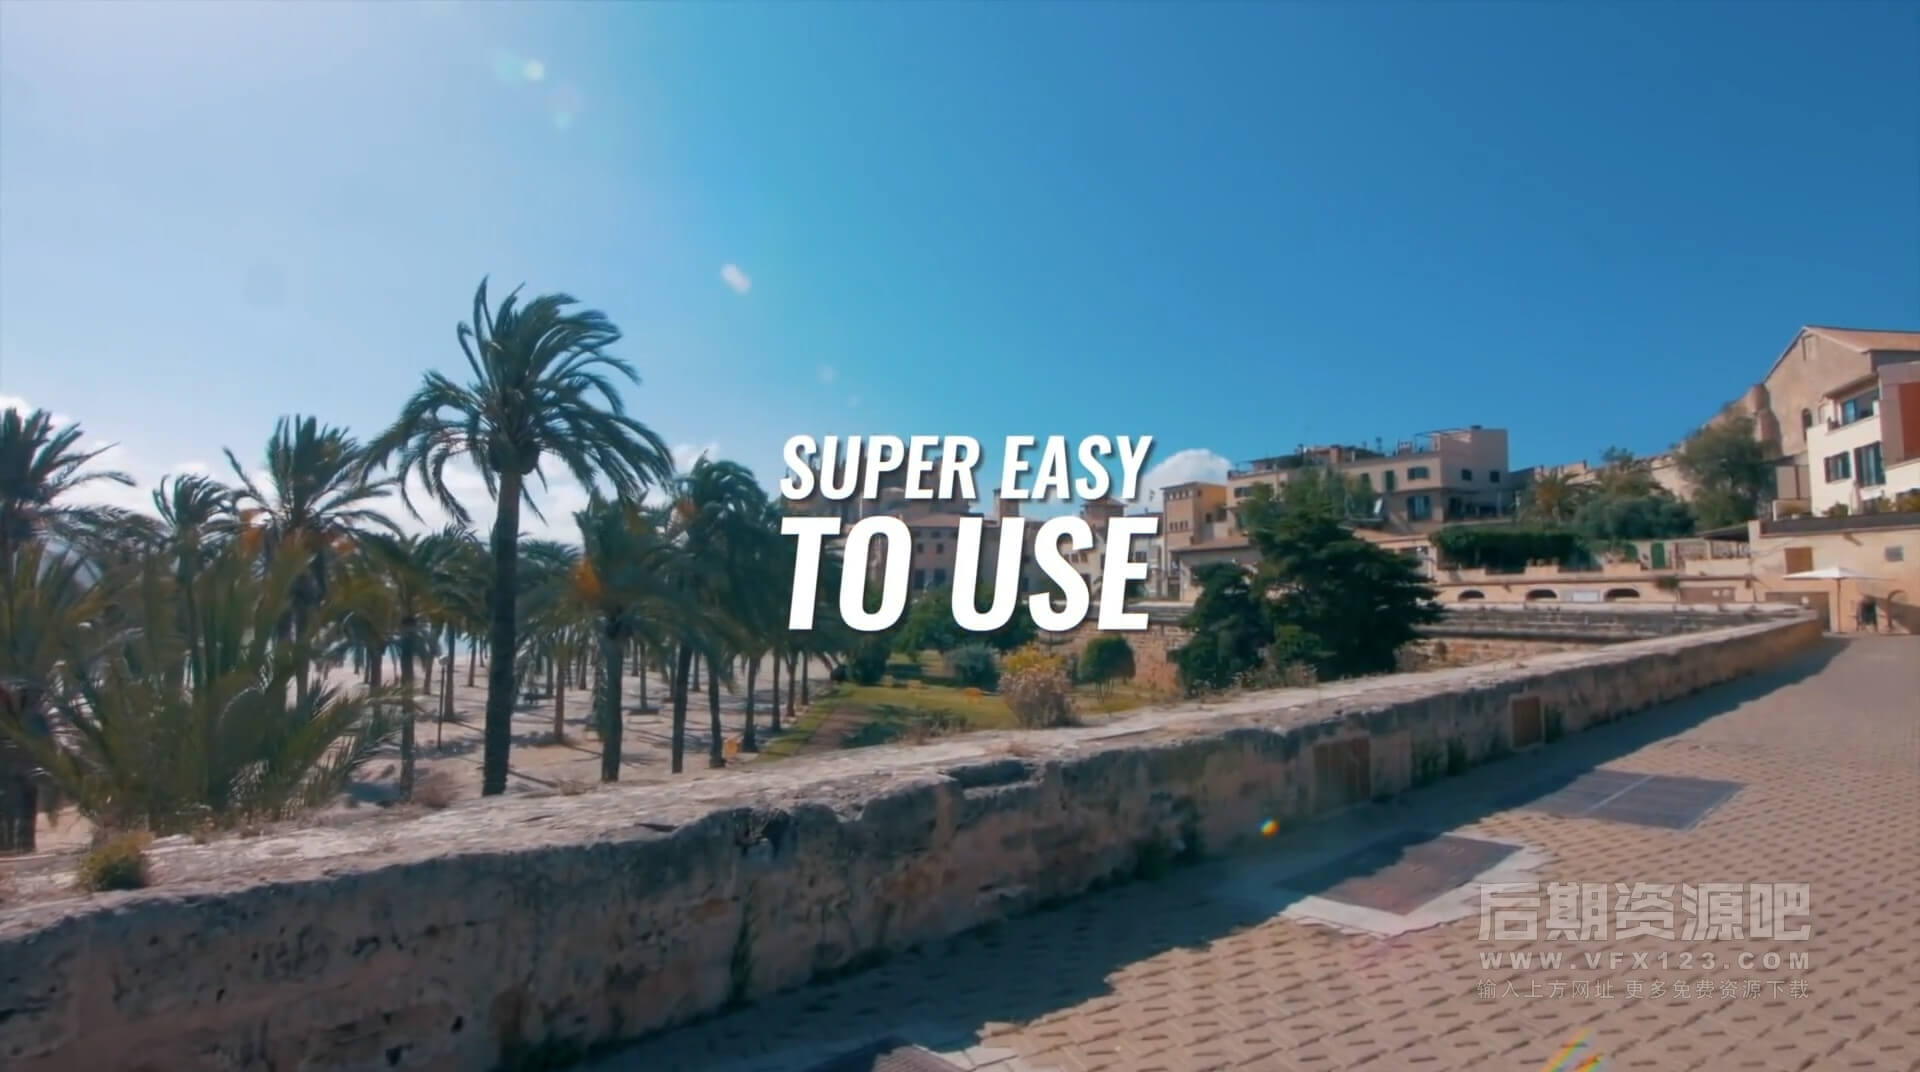 Fcpx转场插件 支持多分辨率镜头摇移缩放旋转拉伸 Vlog常用转场插件